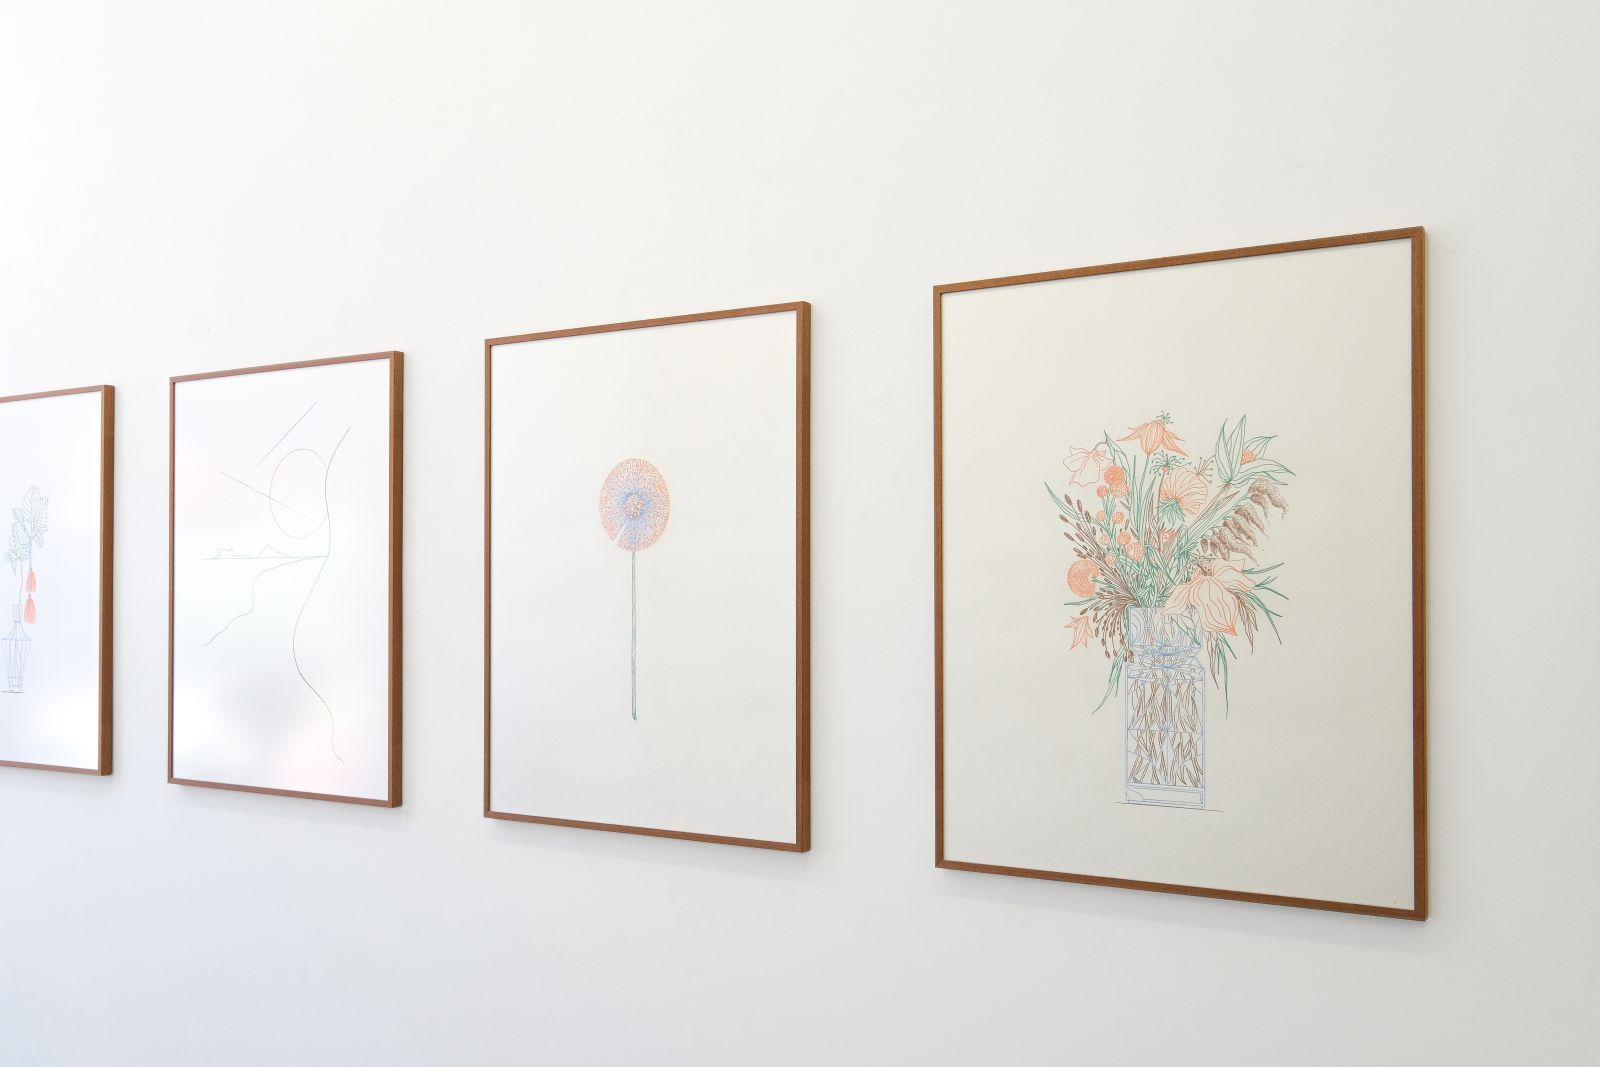 Merijn Hos – Image of a Memory